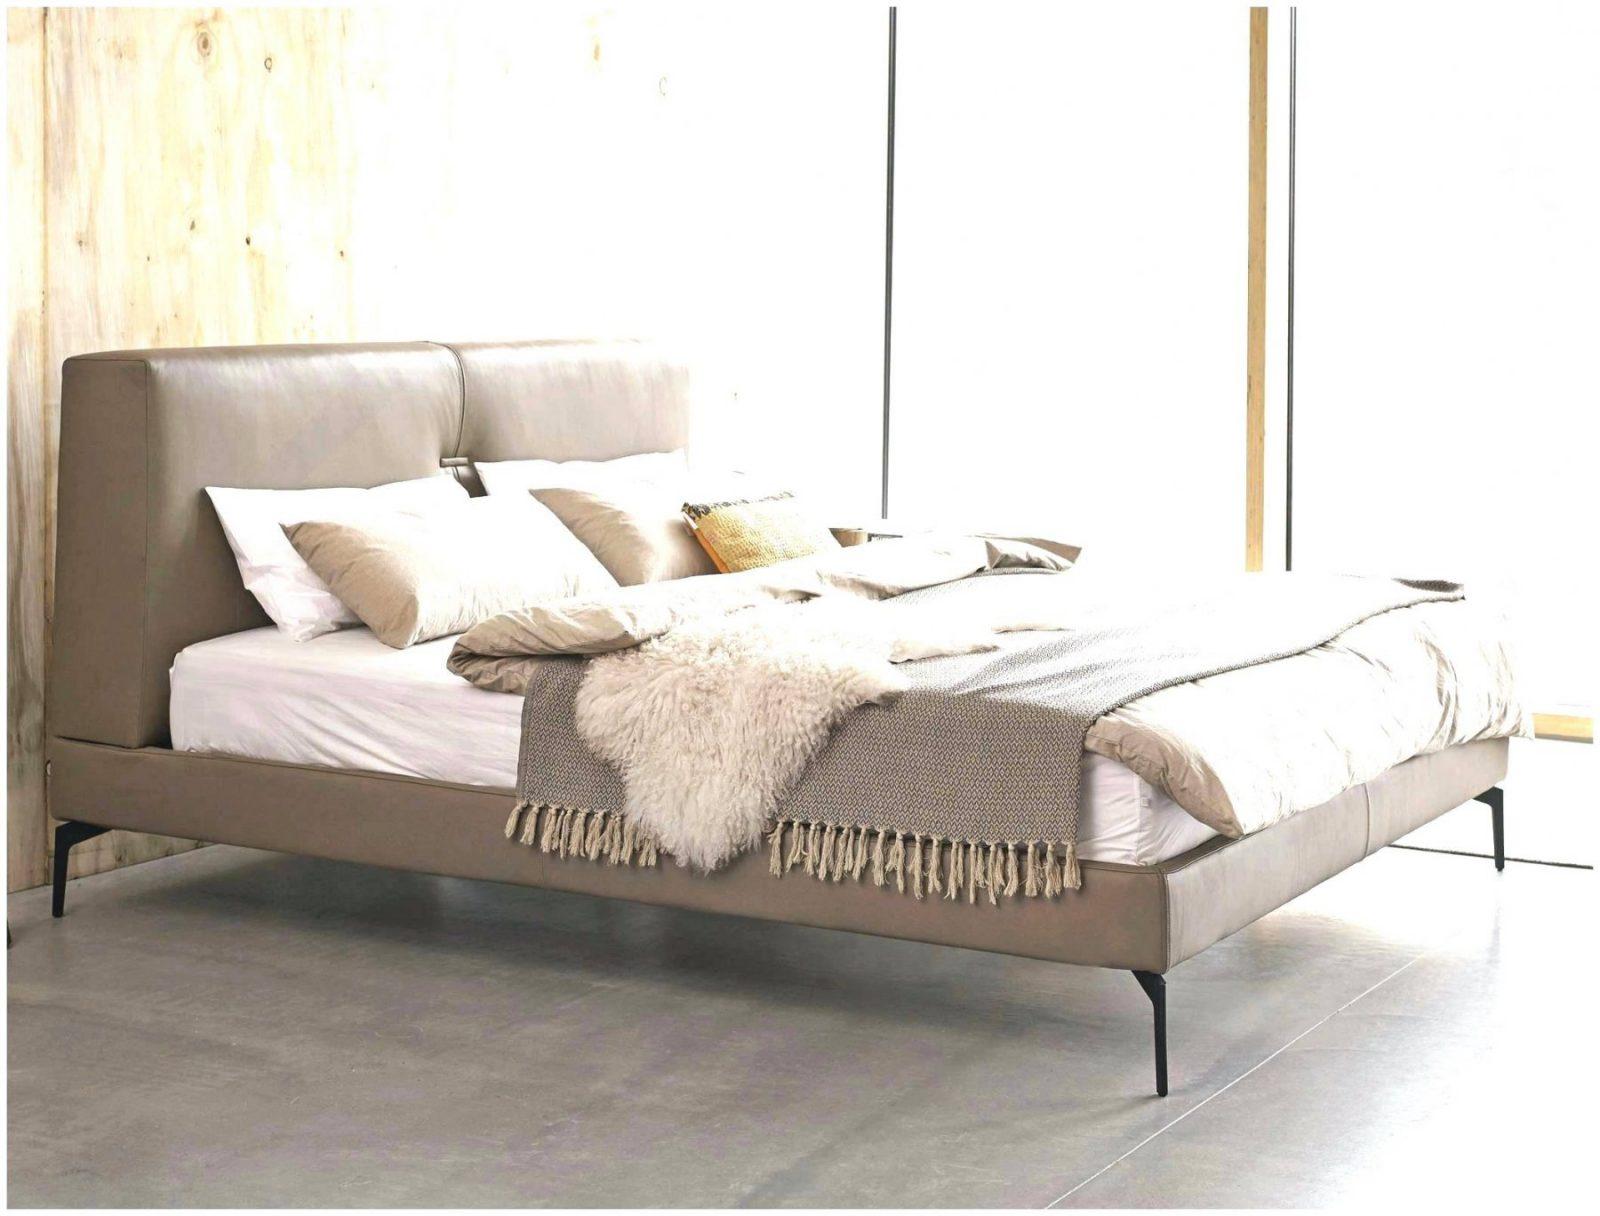 Frisch 32 Betten Günstig Kaufen 180X200 Ideen Wohnträume von Betten Günstig Kaufen 180X200 Bild